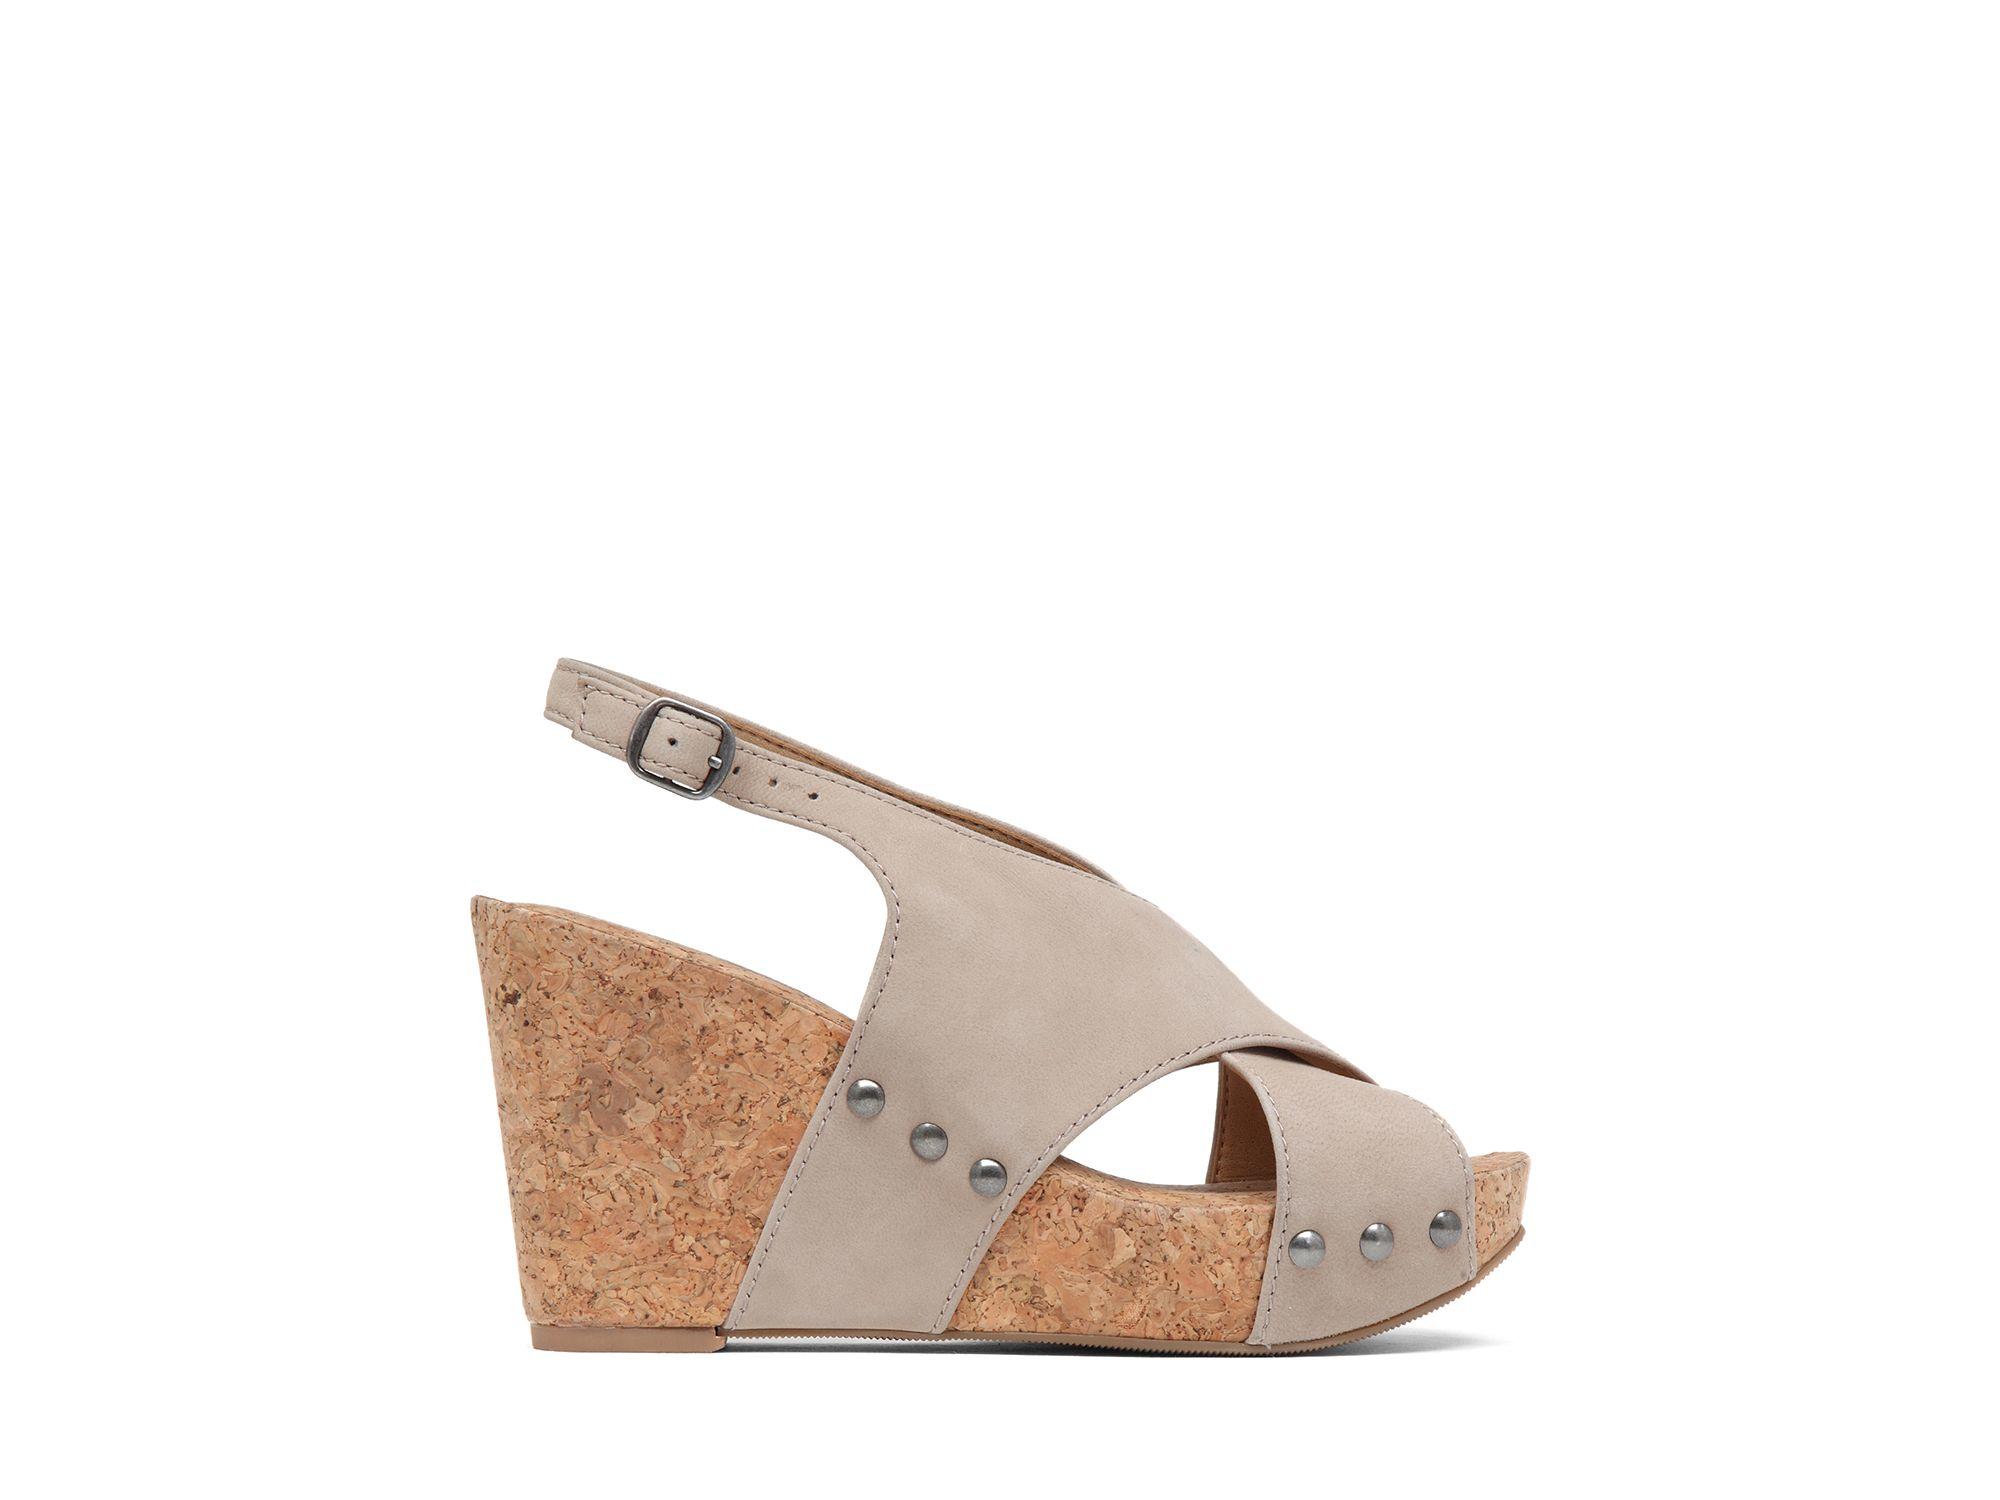 lucky brand open toe platform wedge sandals minari in